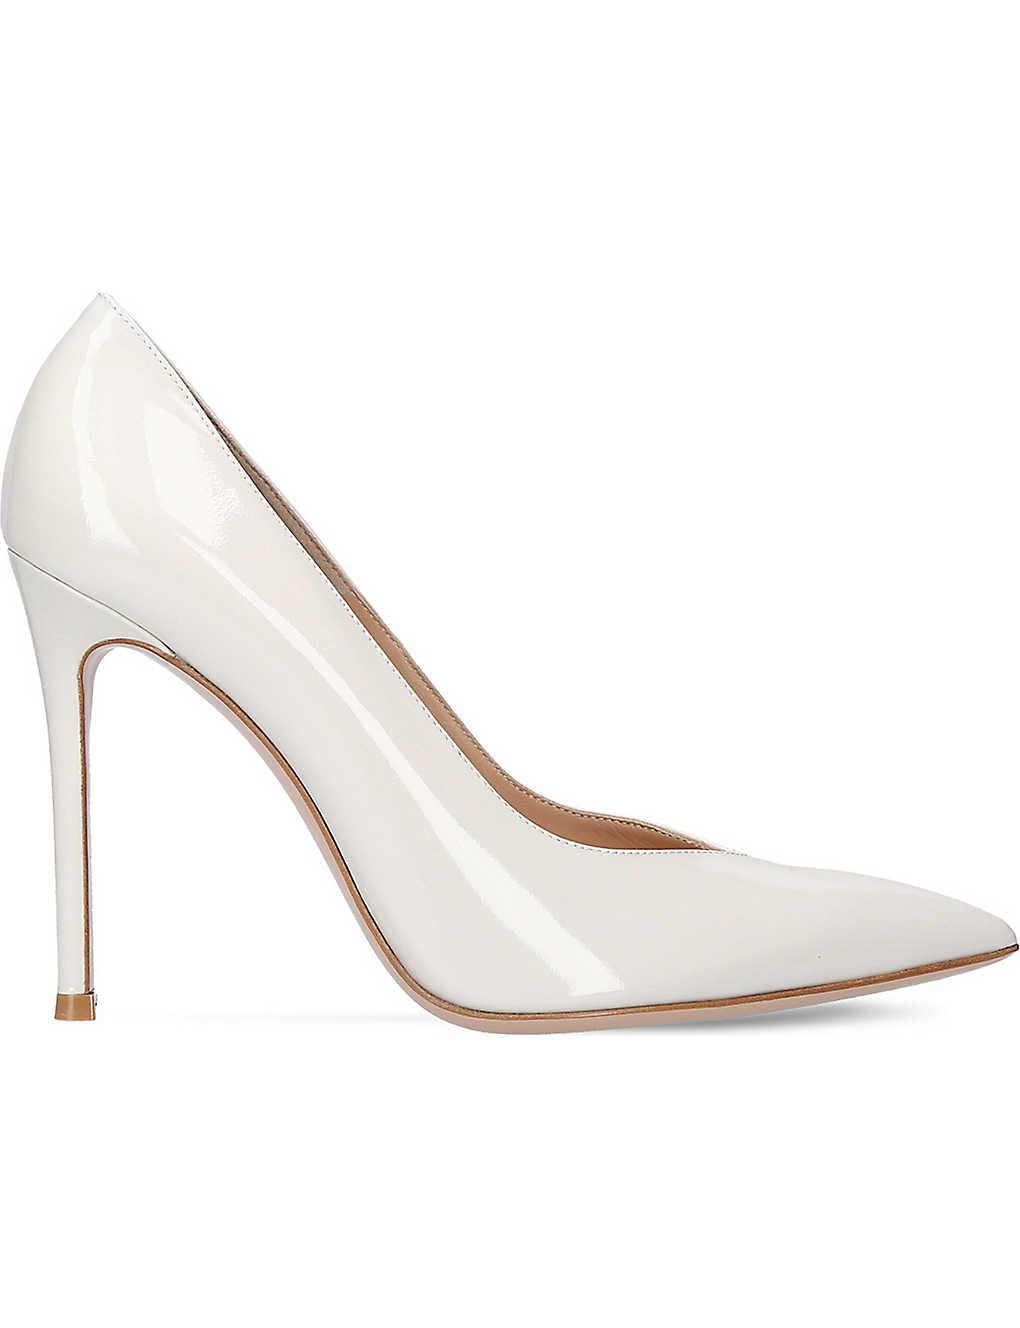 ae1df68fe74 GIANVITO ROSSI - Paris 105 patent-leather court shoes